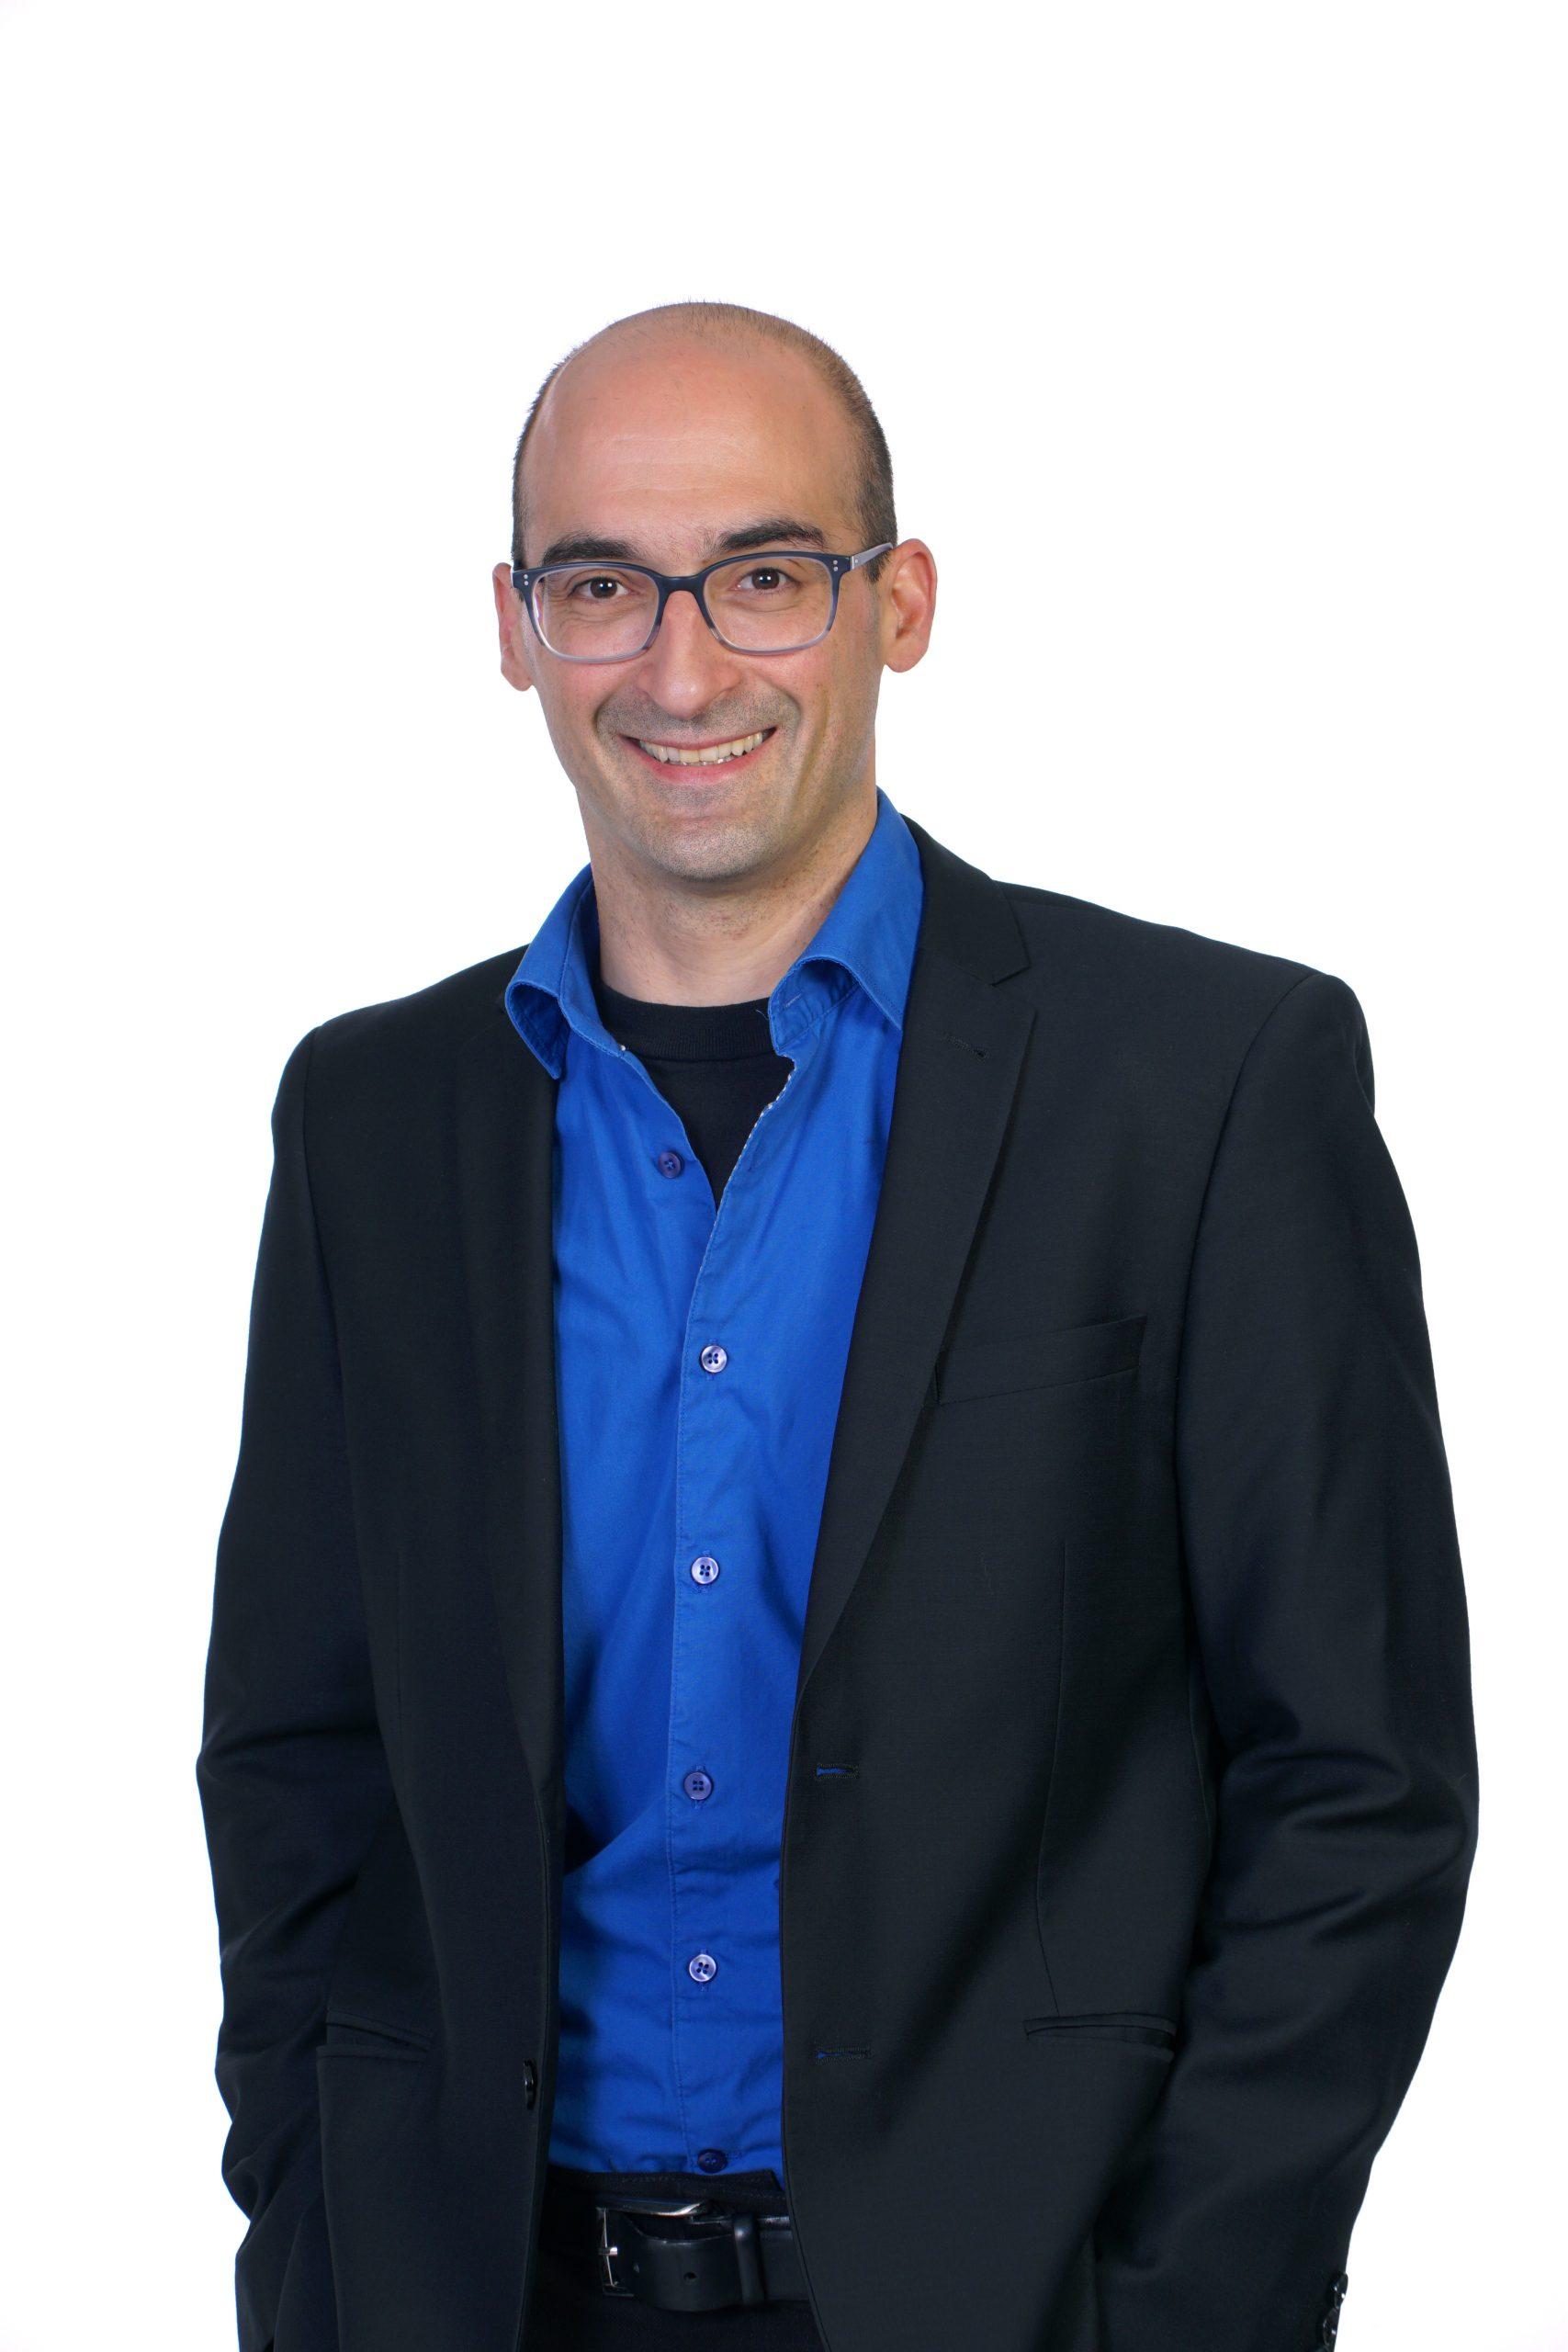 Giovanni Pucella, Directeur innovation, usine, TI & Ingénierie